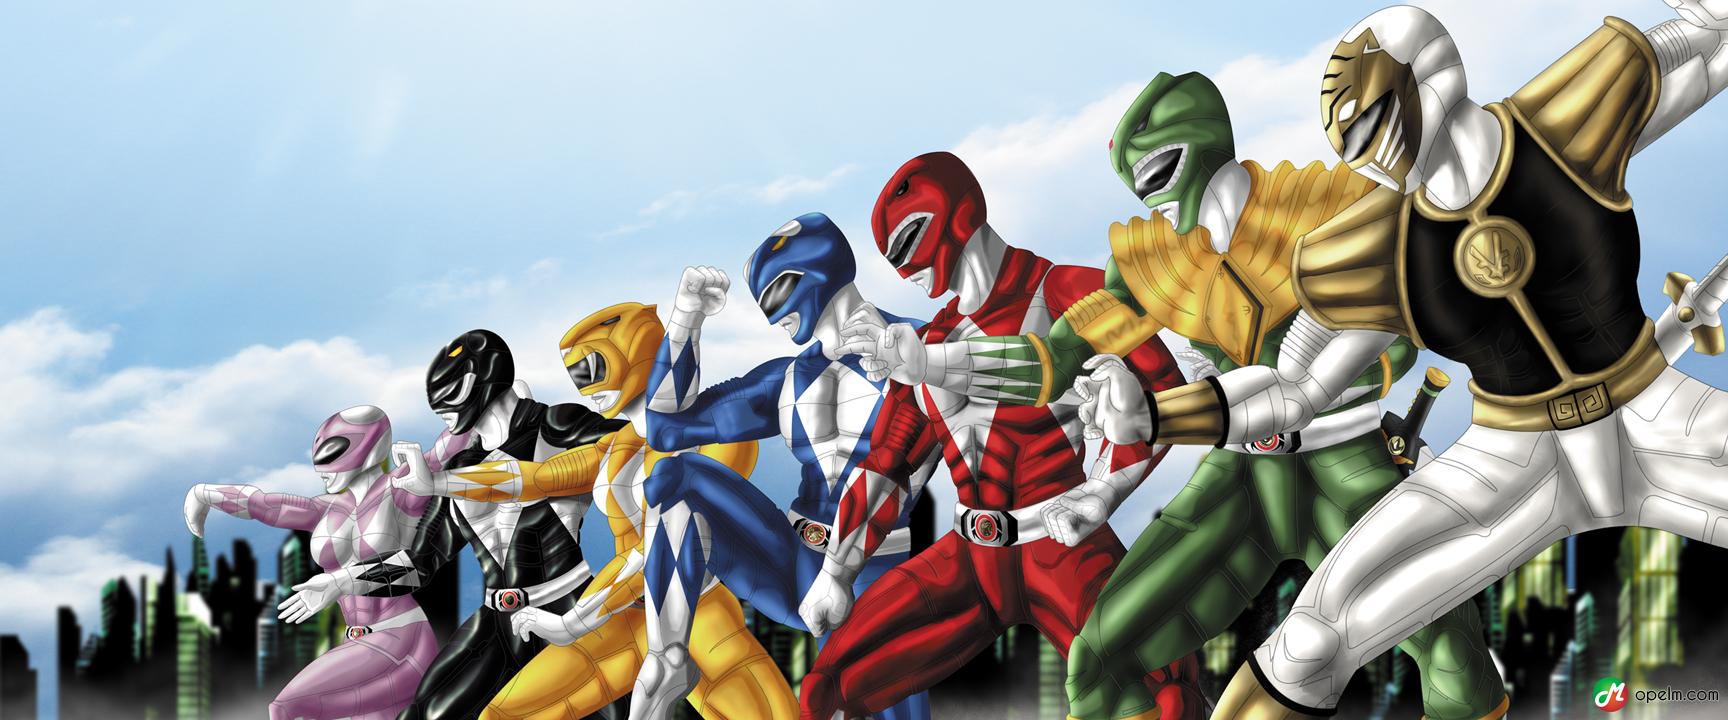 Free Power Rangers Wallpapers Wallpapersafari